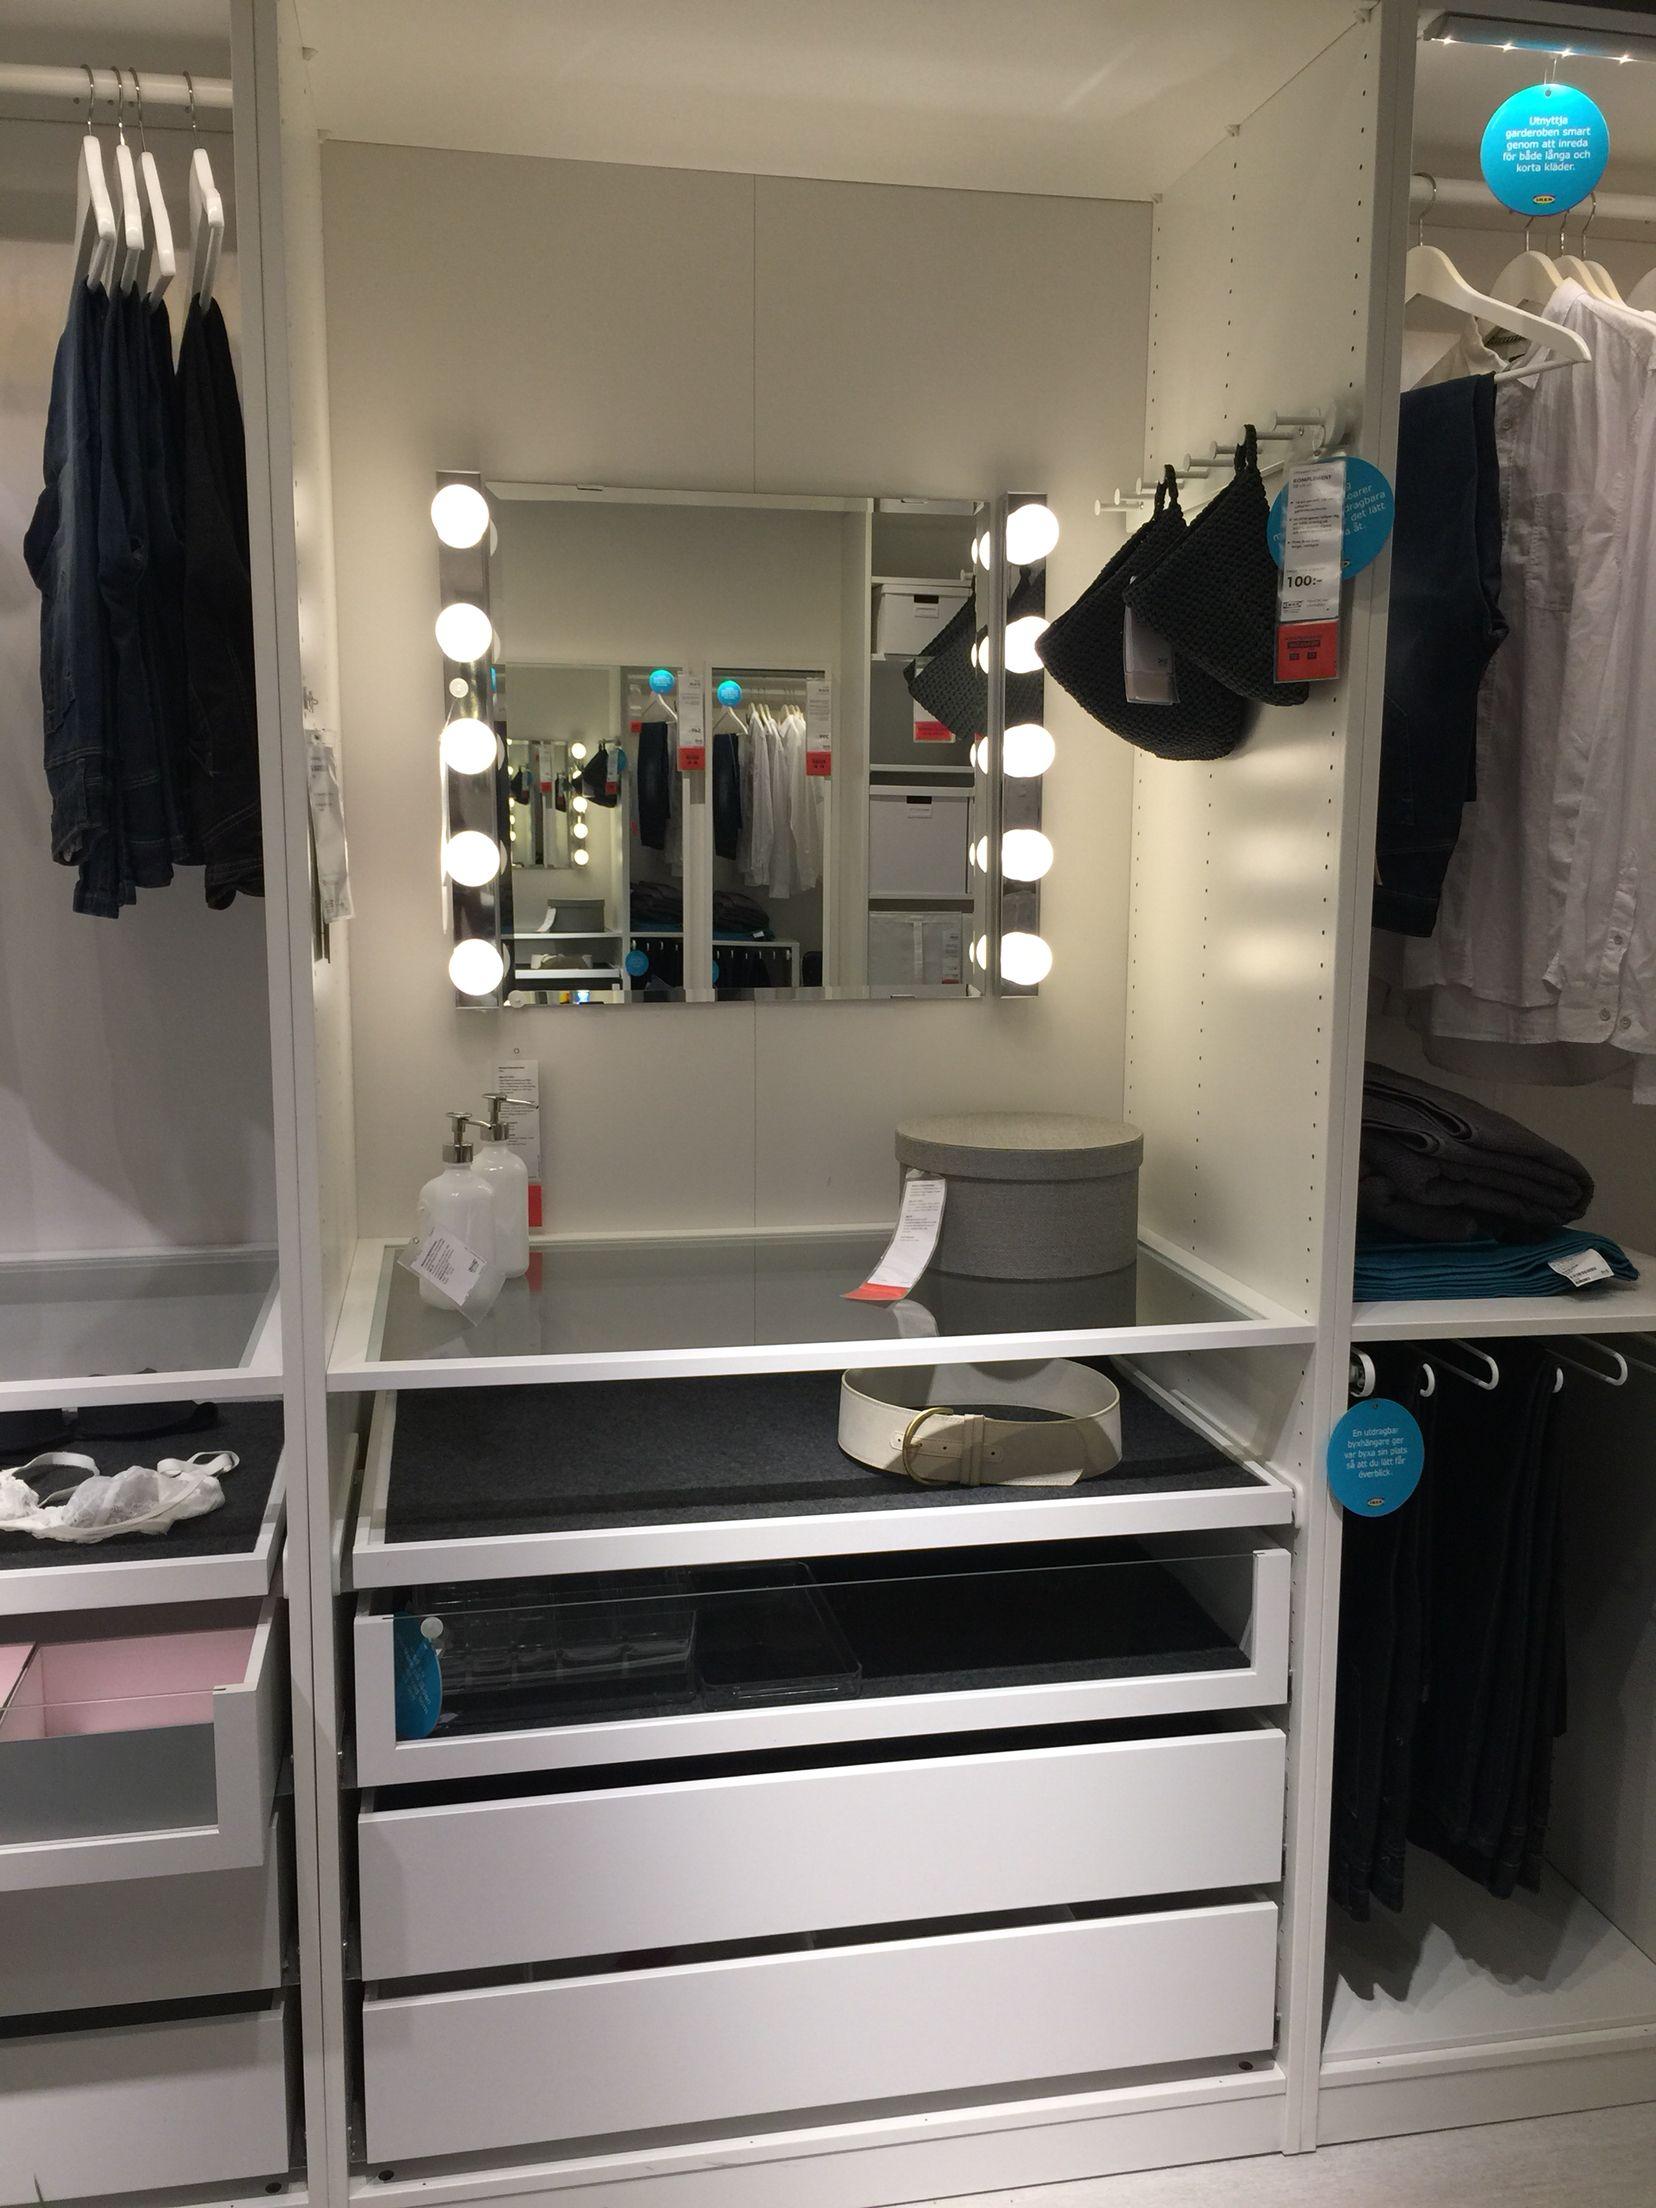 ikea pax build in makeup station 910 walkin closet pinterest garderob garderober och sovrum. Black Bedroom Furniture Sets. Home Design Ideas